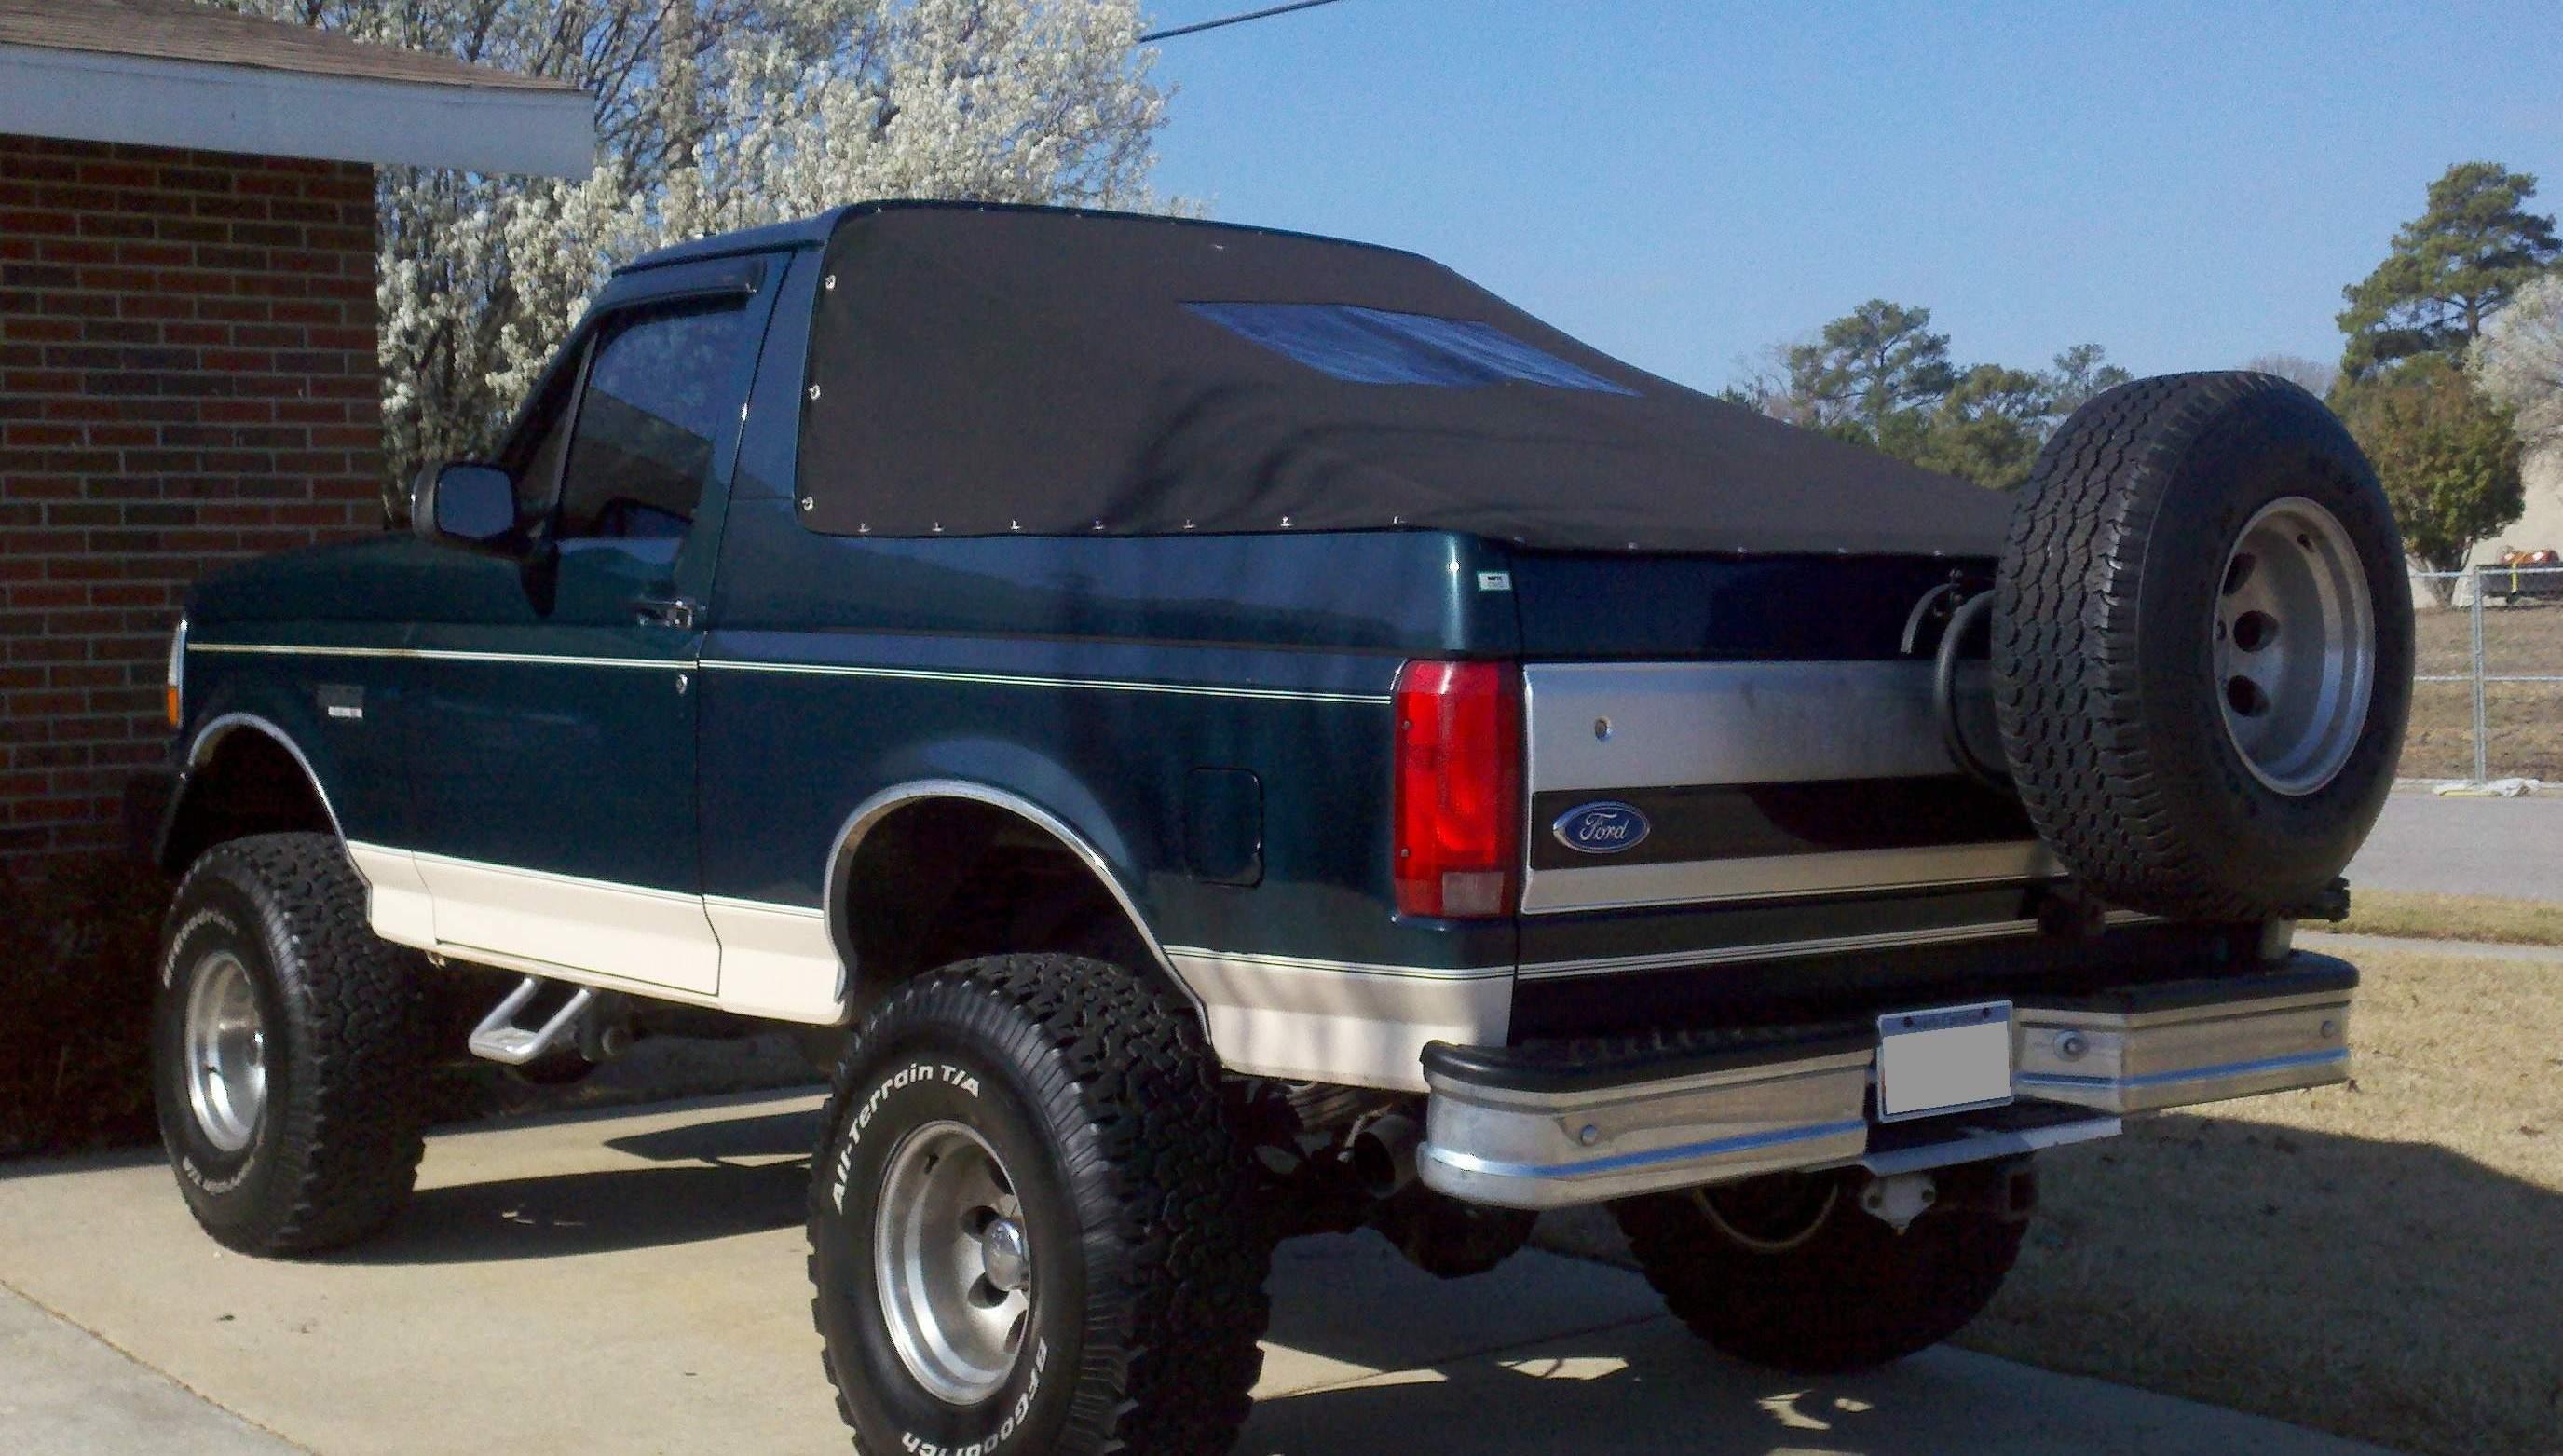 Roof Rack Reply 83 88 Ford Ranger Off Road Fiberglass